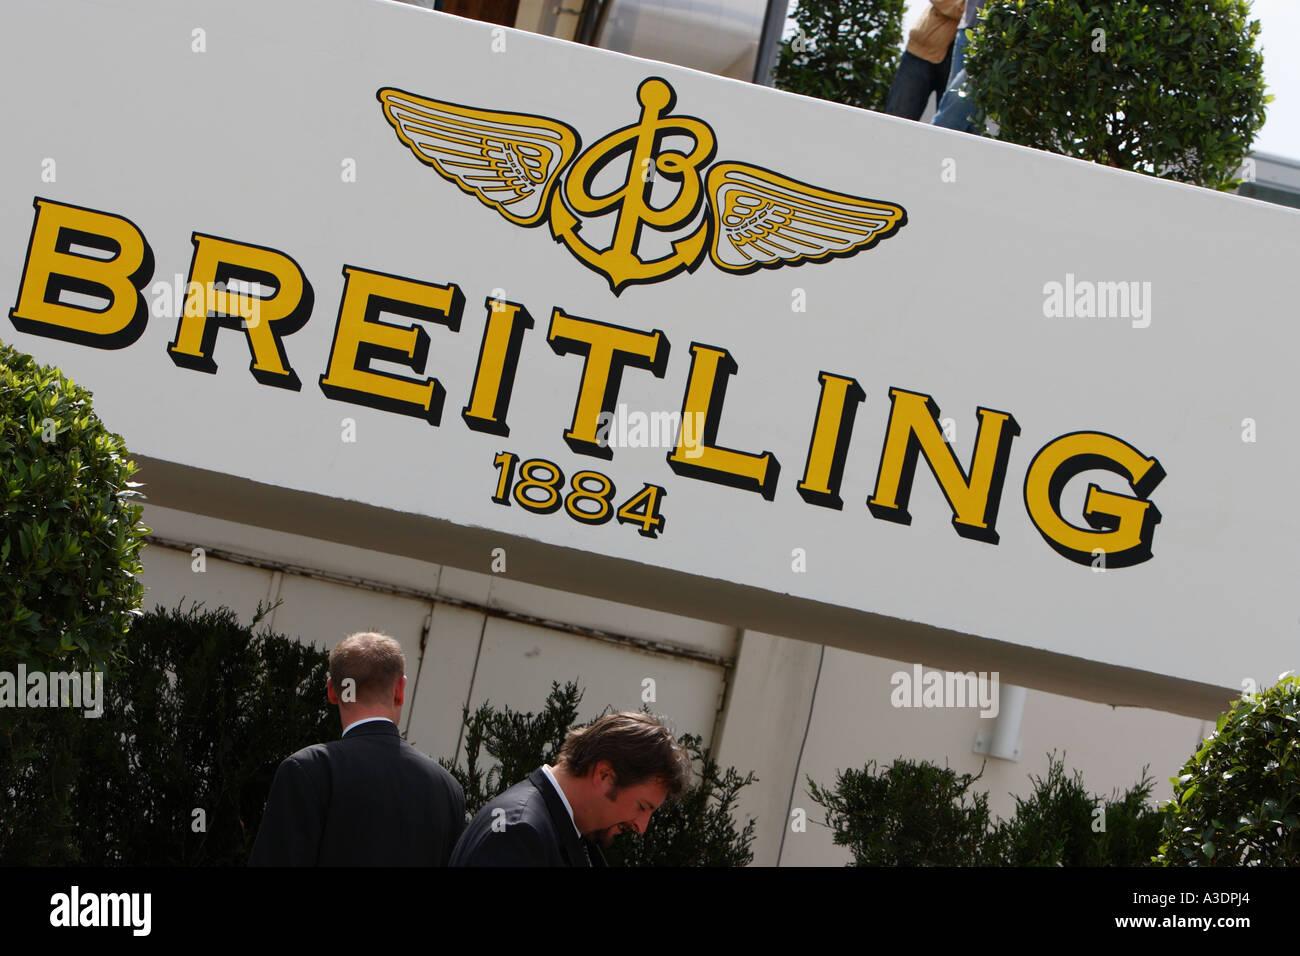 Breiting Stock Photo